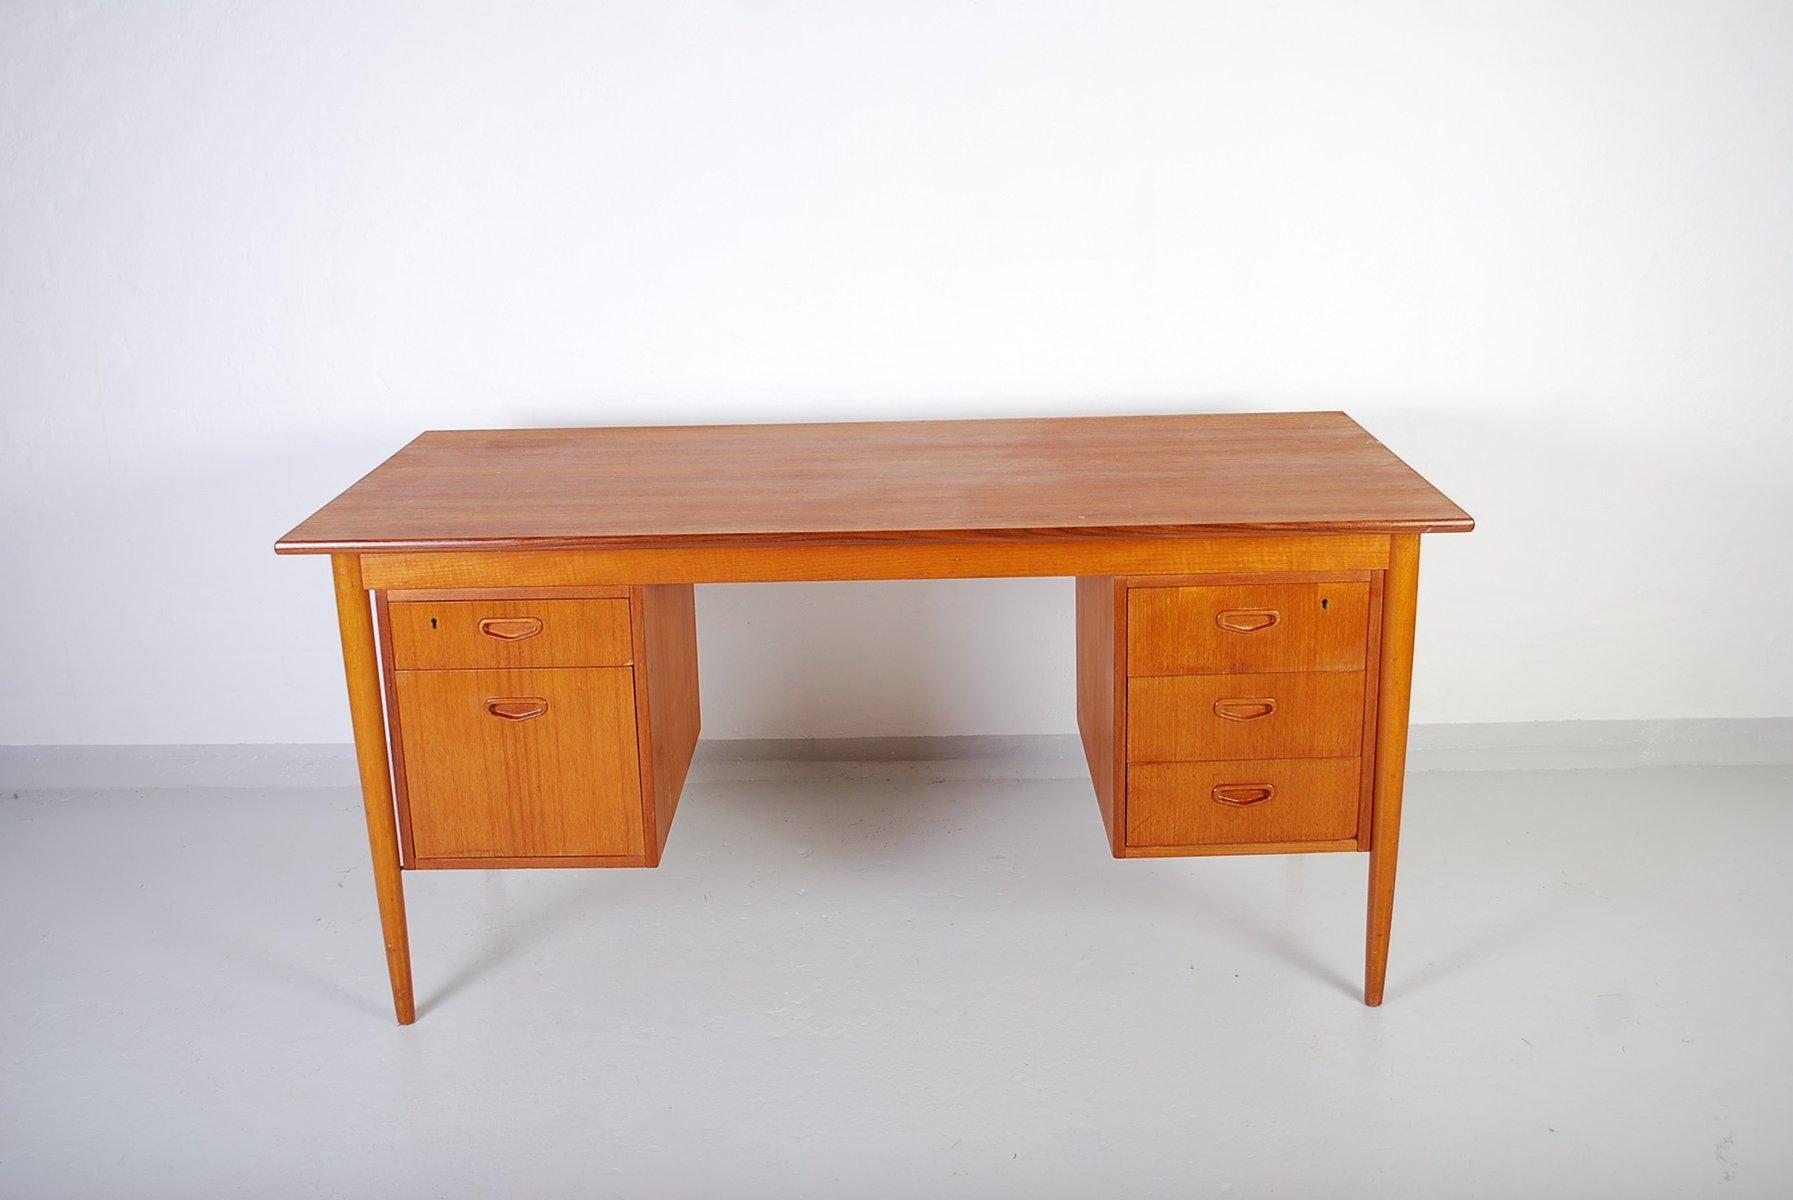 bureau mid century en teck avec cinq tiroirs su de en vente sur pamono. Black Bedroom Furniture Sets. Home Design Ideas